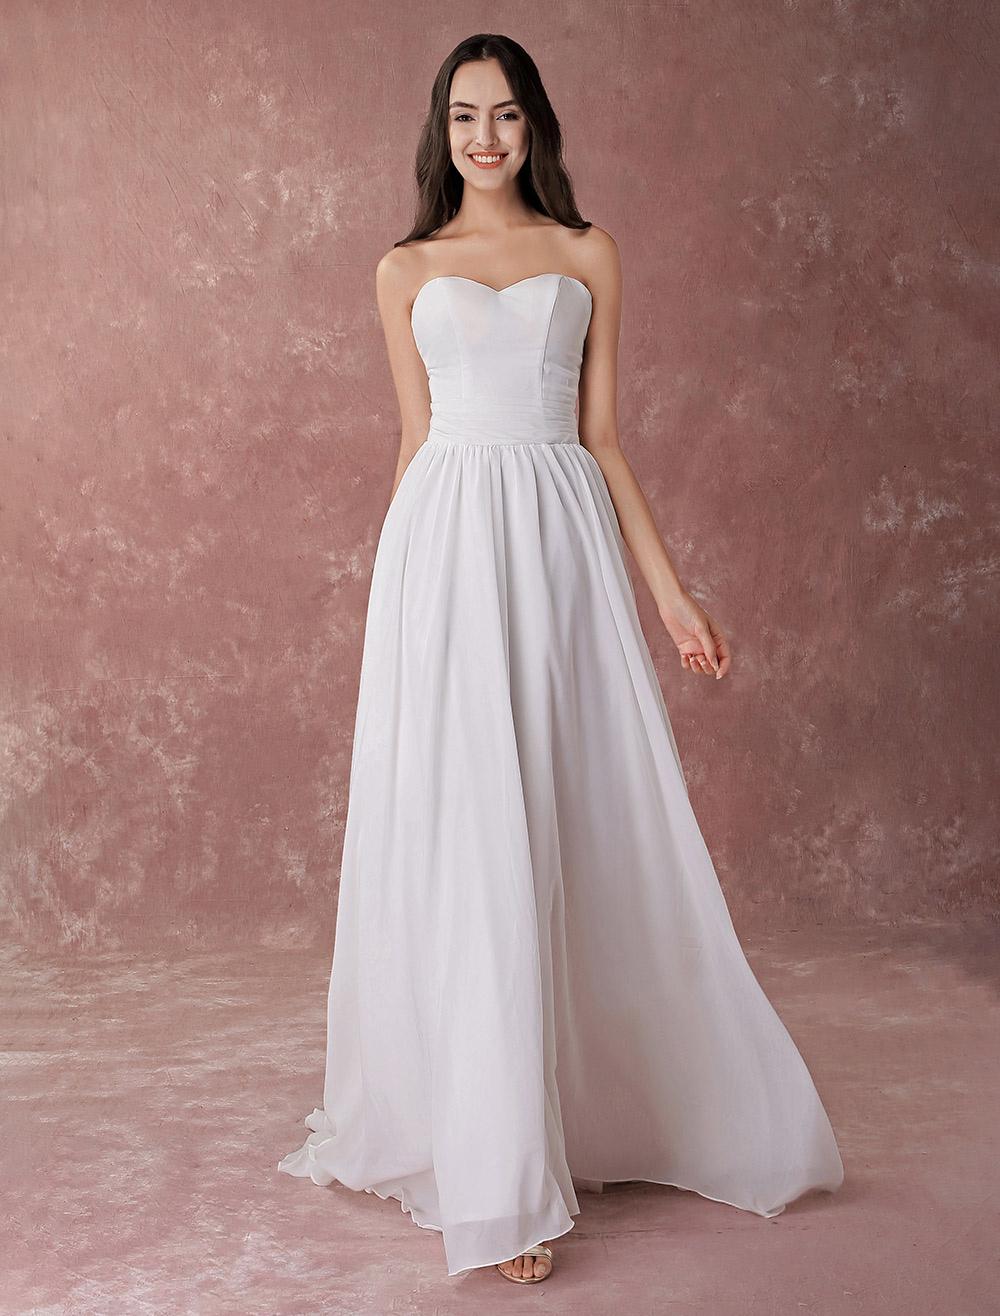 Sweetheart Neckline Beach Wedding Dresses